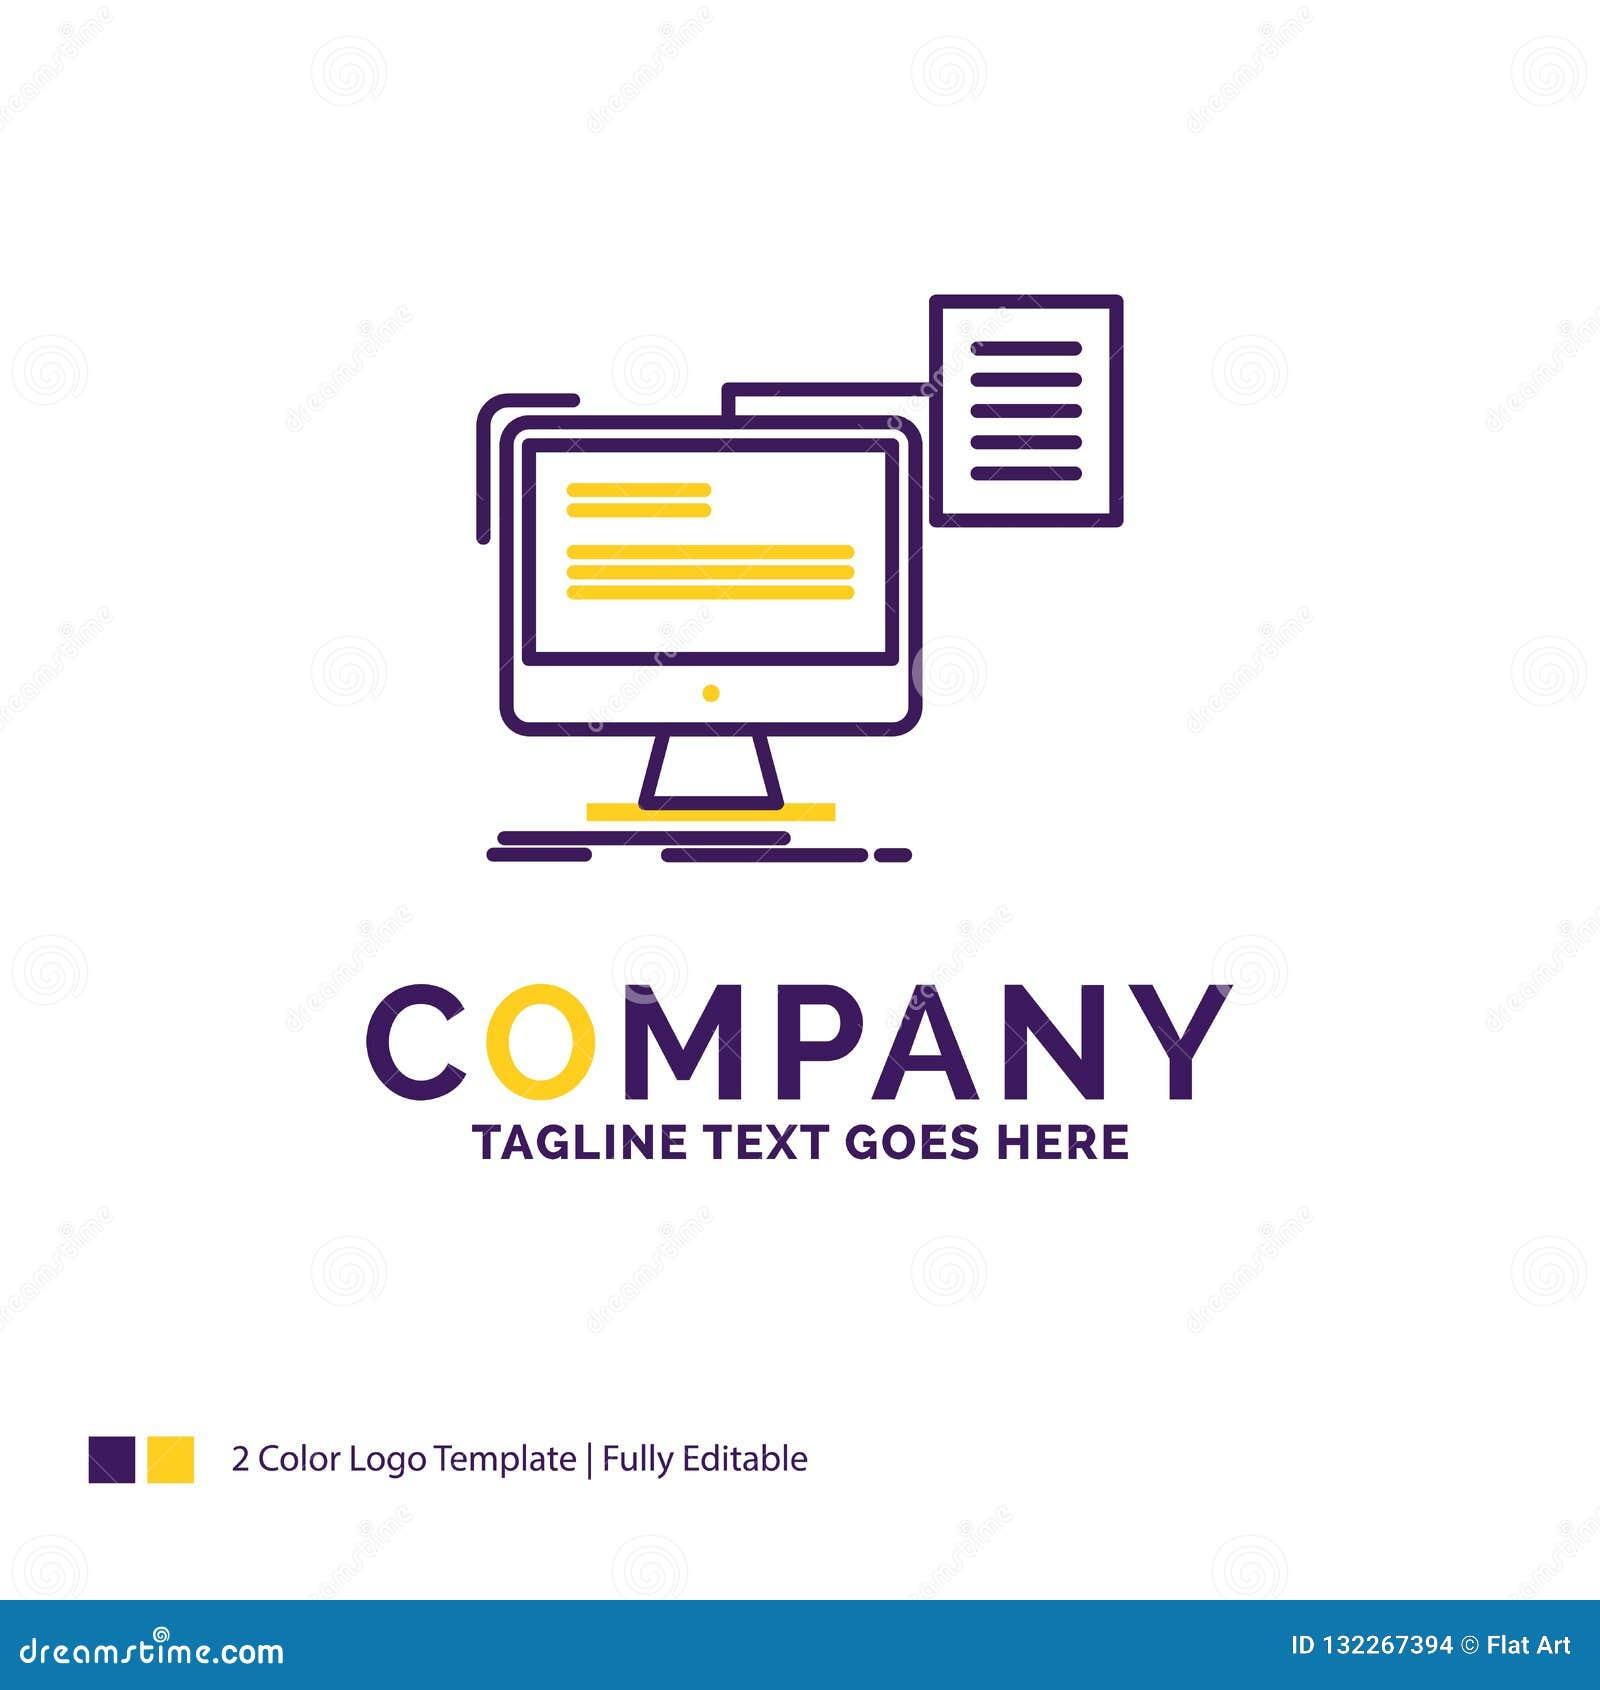 Company Name Logo Design For Resume Storage Print Cv